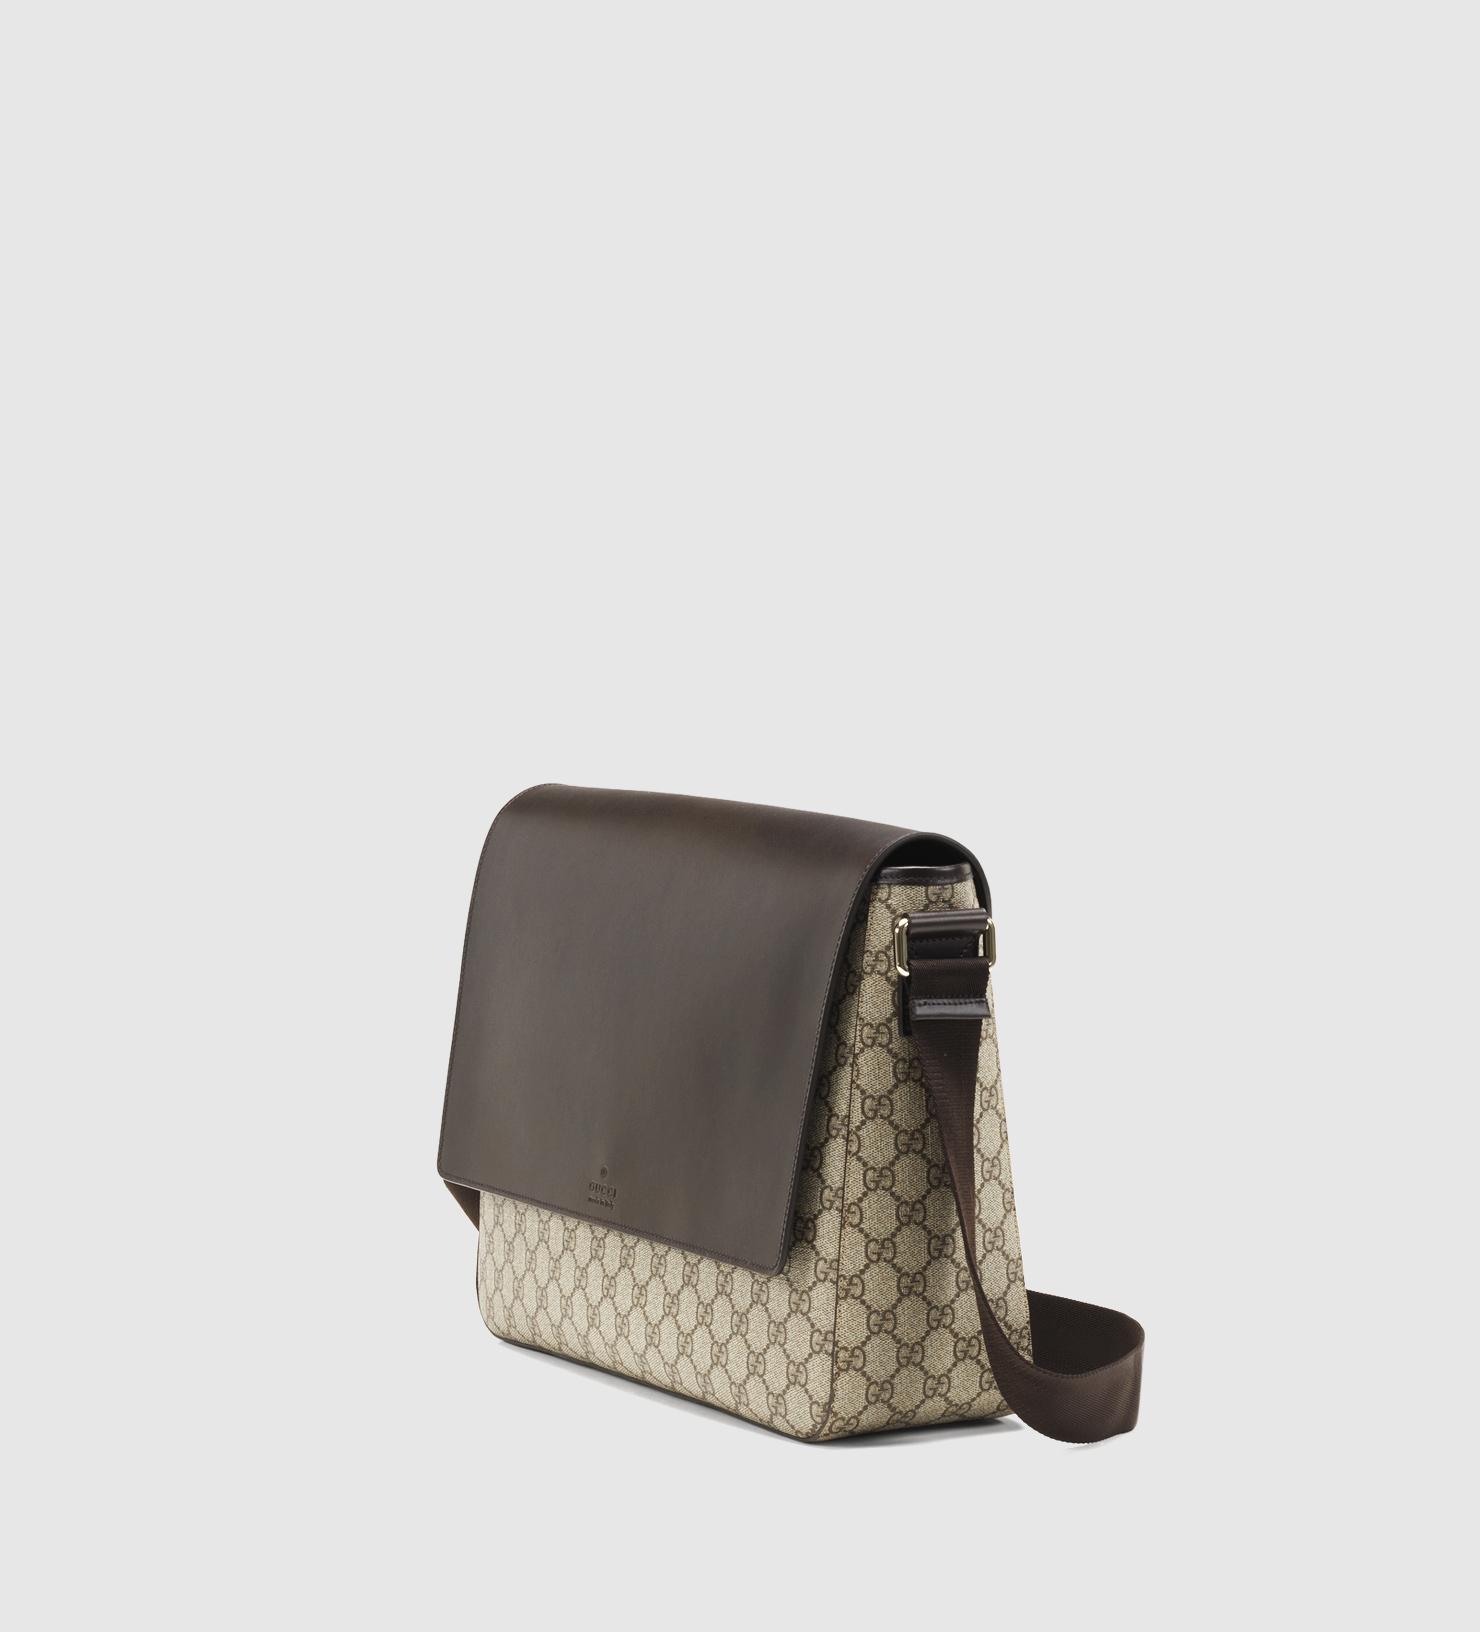 28f0f86ed6d4 Gucci Gg Supreme Canvas Messenger Bag in Brown - Lyst